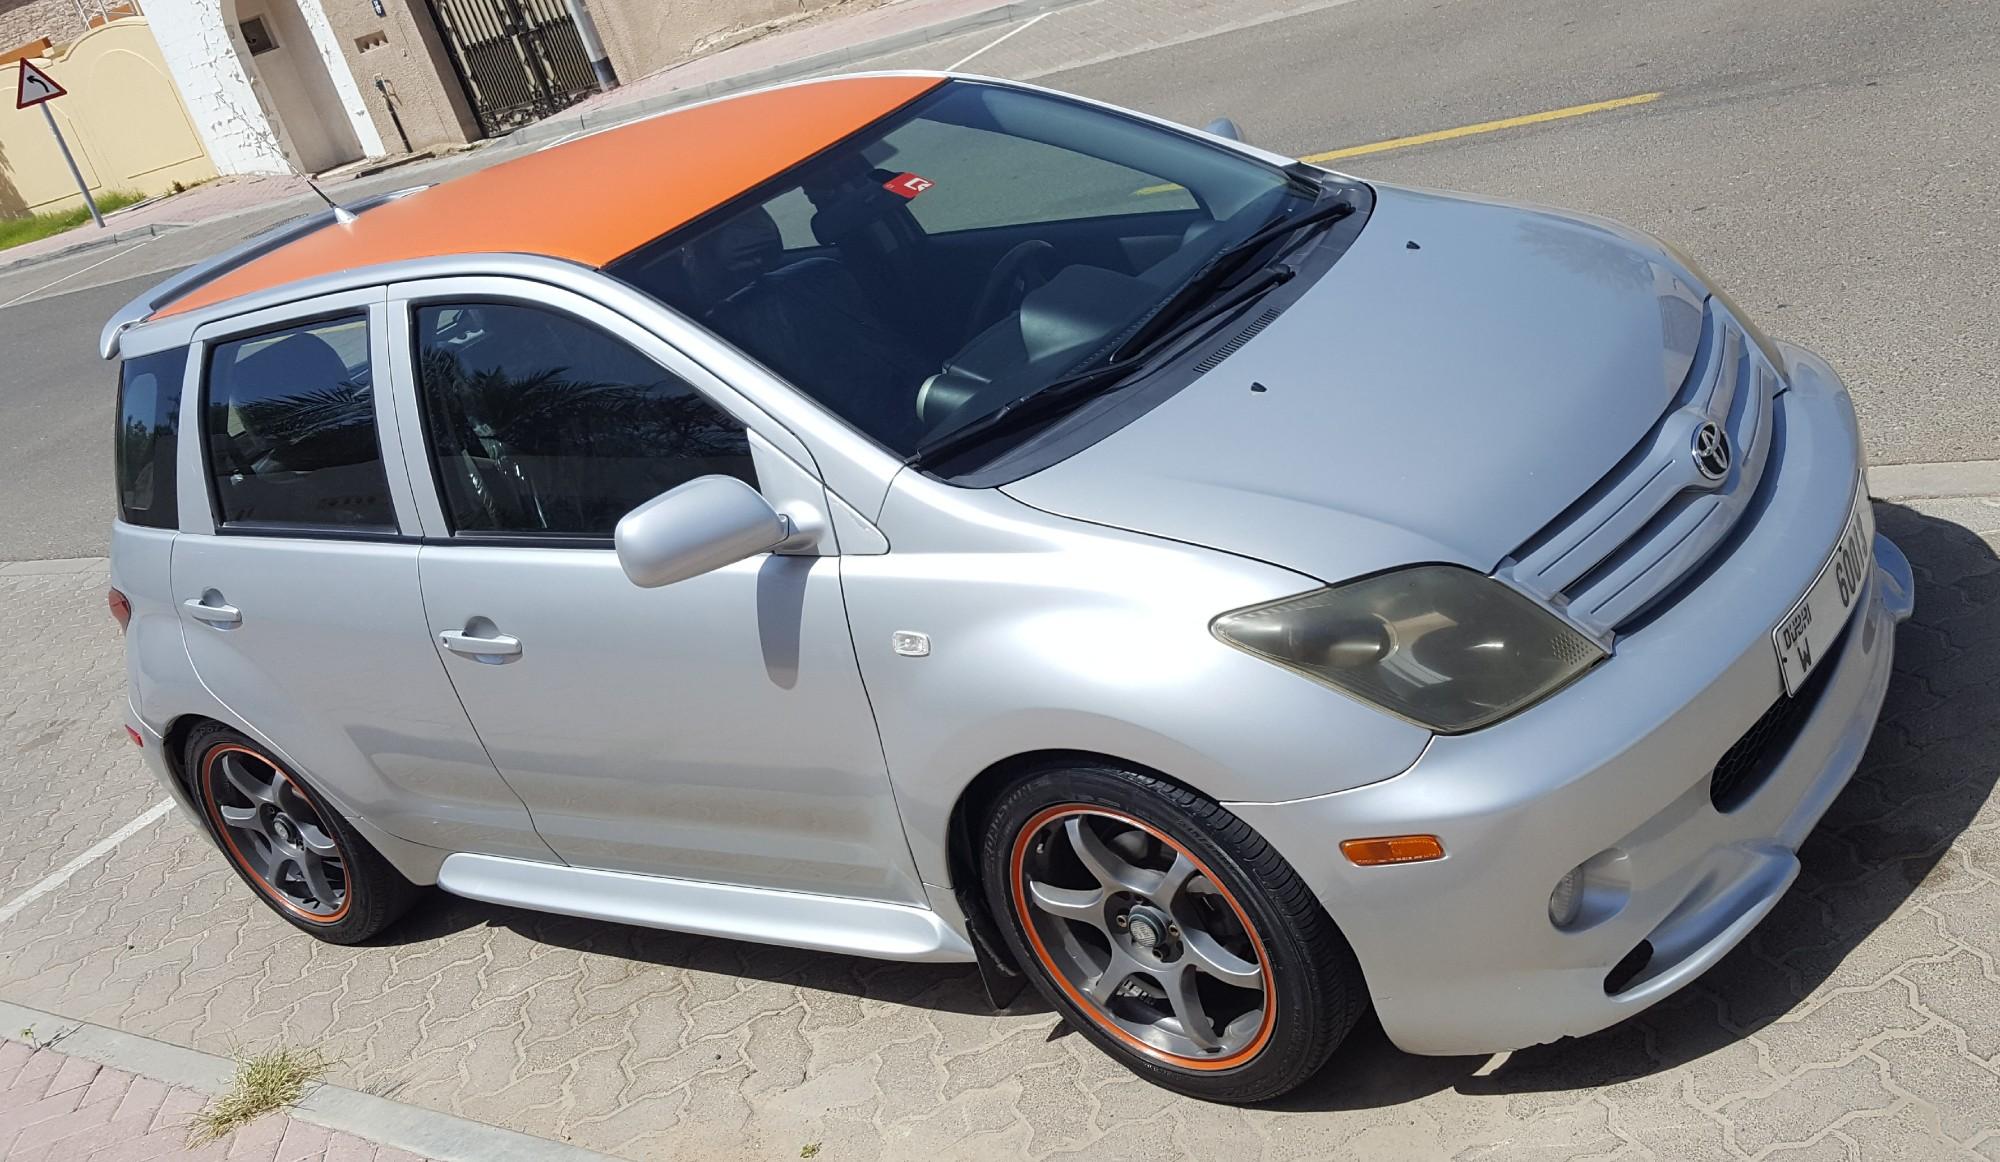 Kekurangan Toyota Yaris 2004 Top Model Tahun Ini